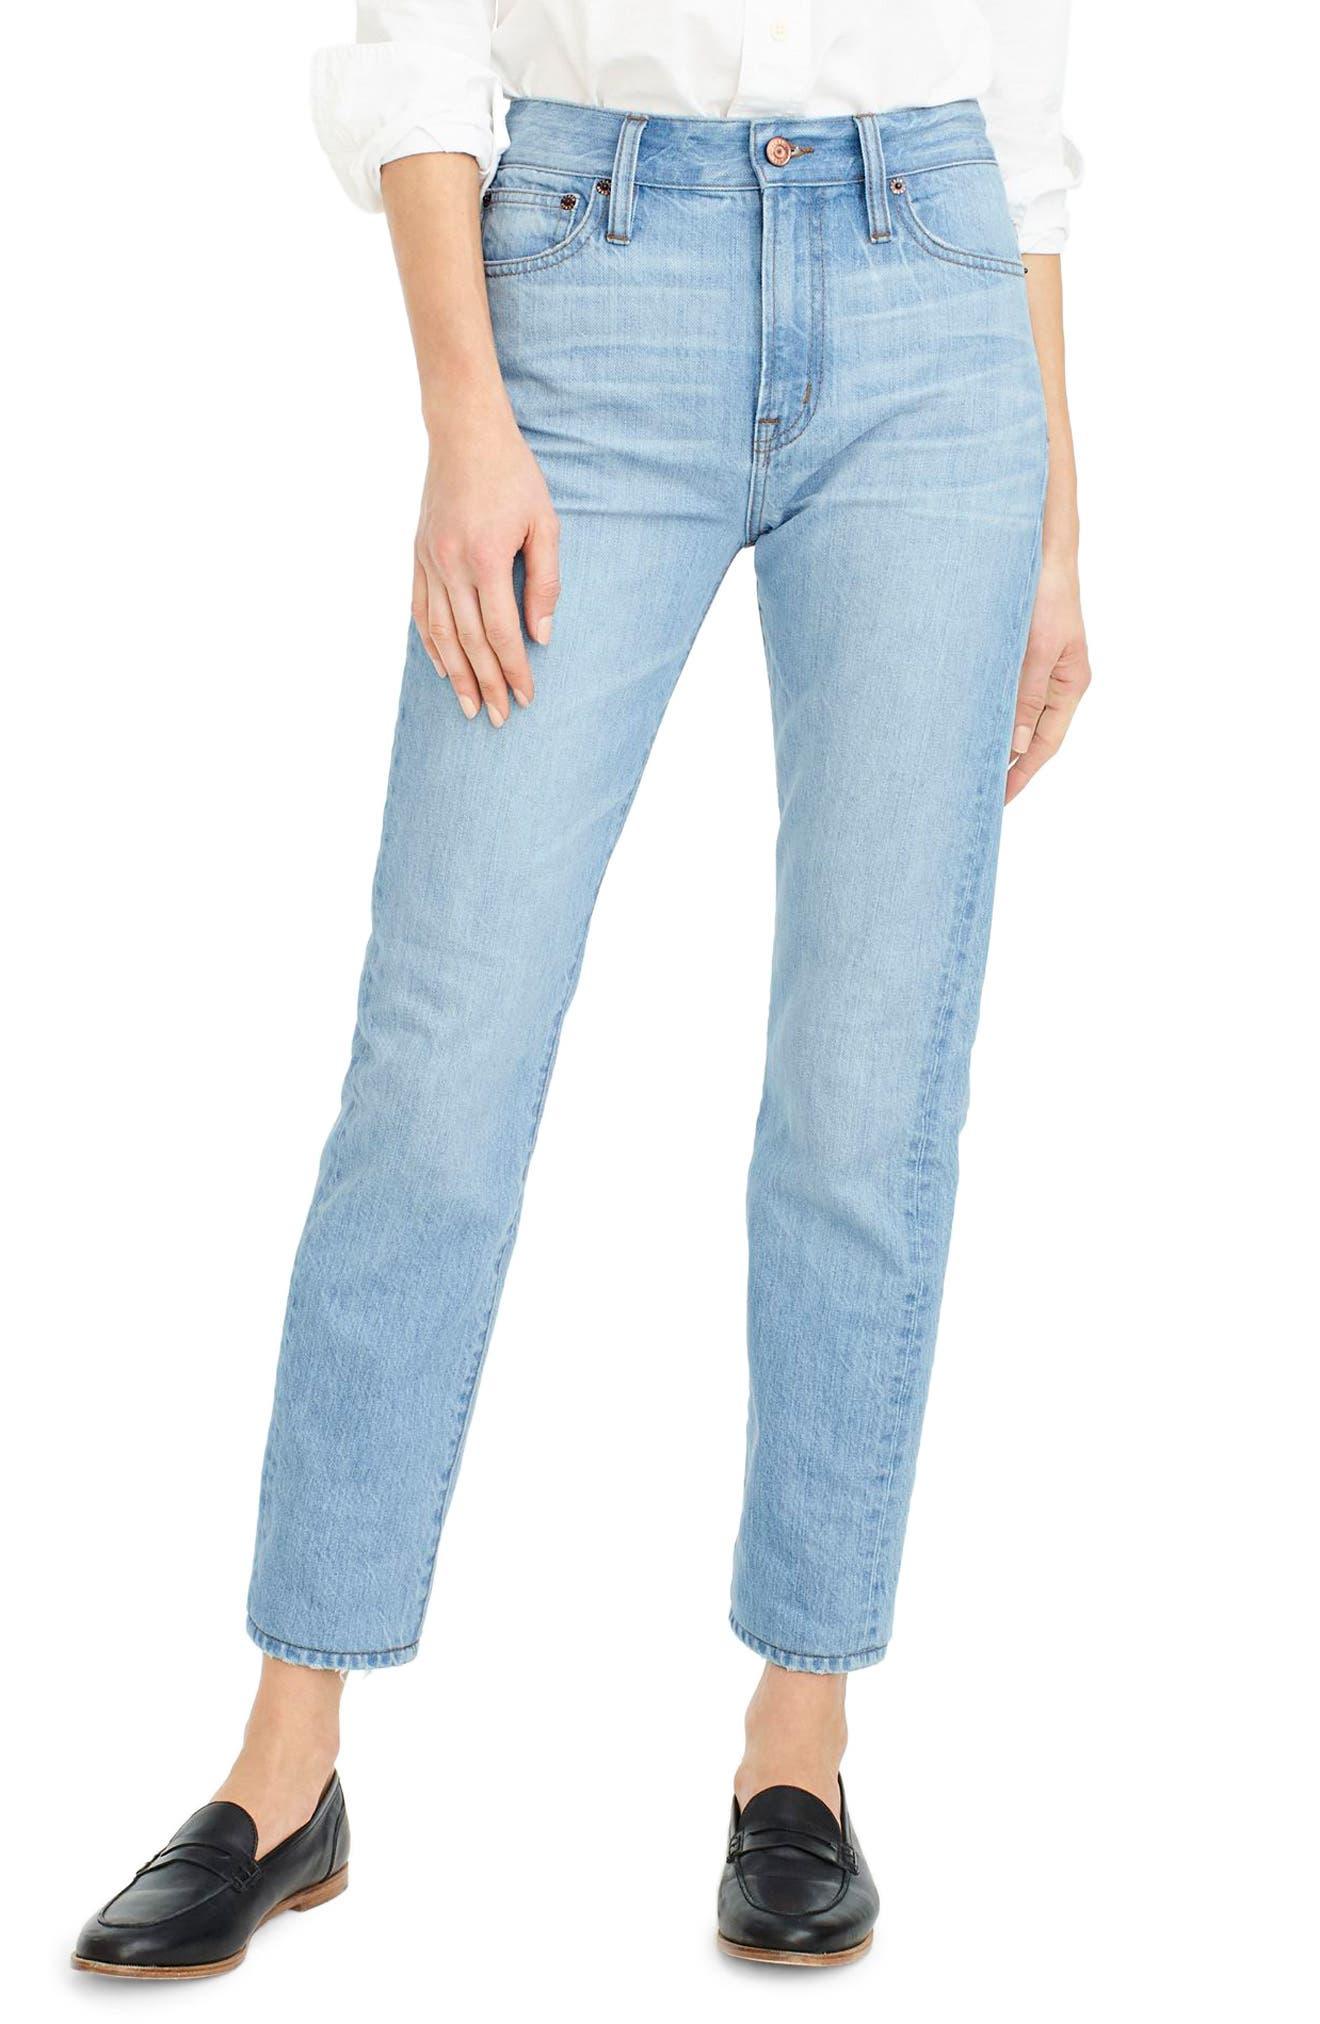 Retro Big Idea Jeans,                             Main thumbnail 1, color,                             Fern Wash